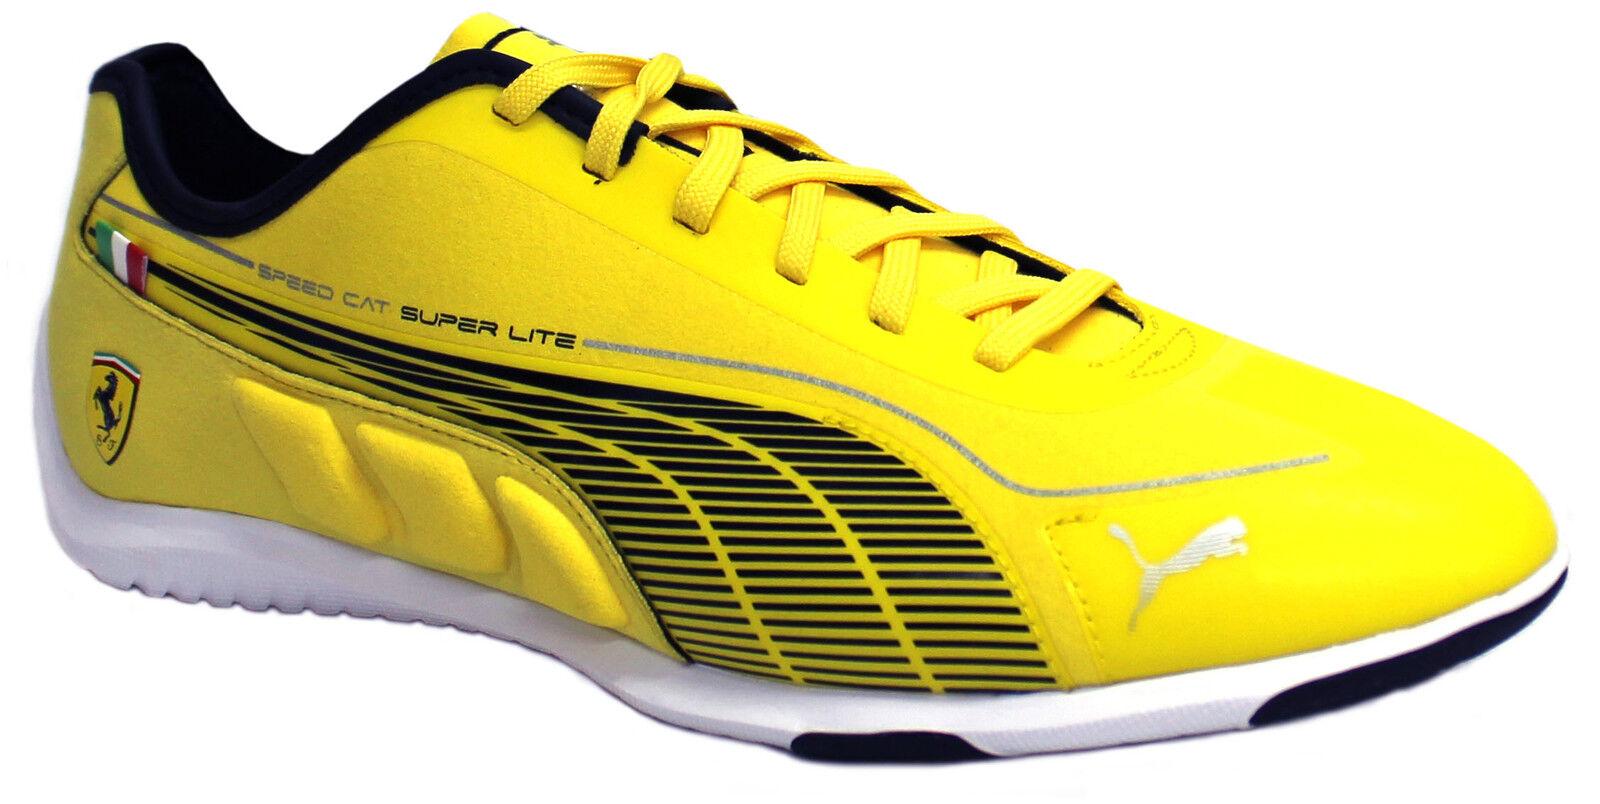 Puma Speed Cat Super Lite Low SF Yellow   Black Mens Trainers 304377 ... ed0f604c4174